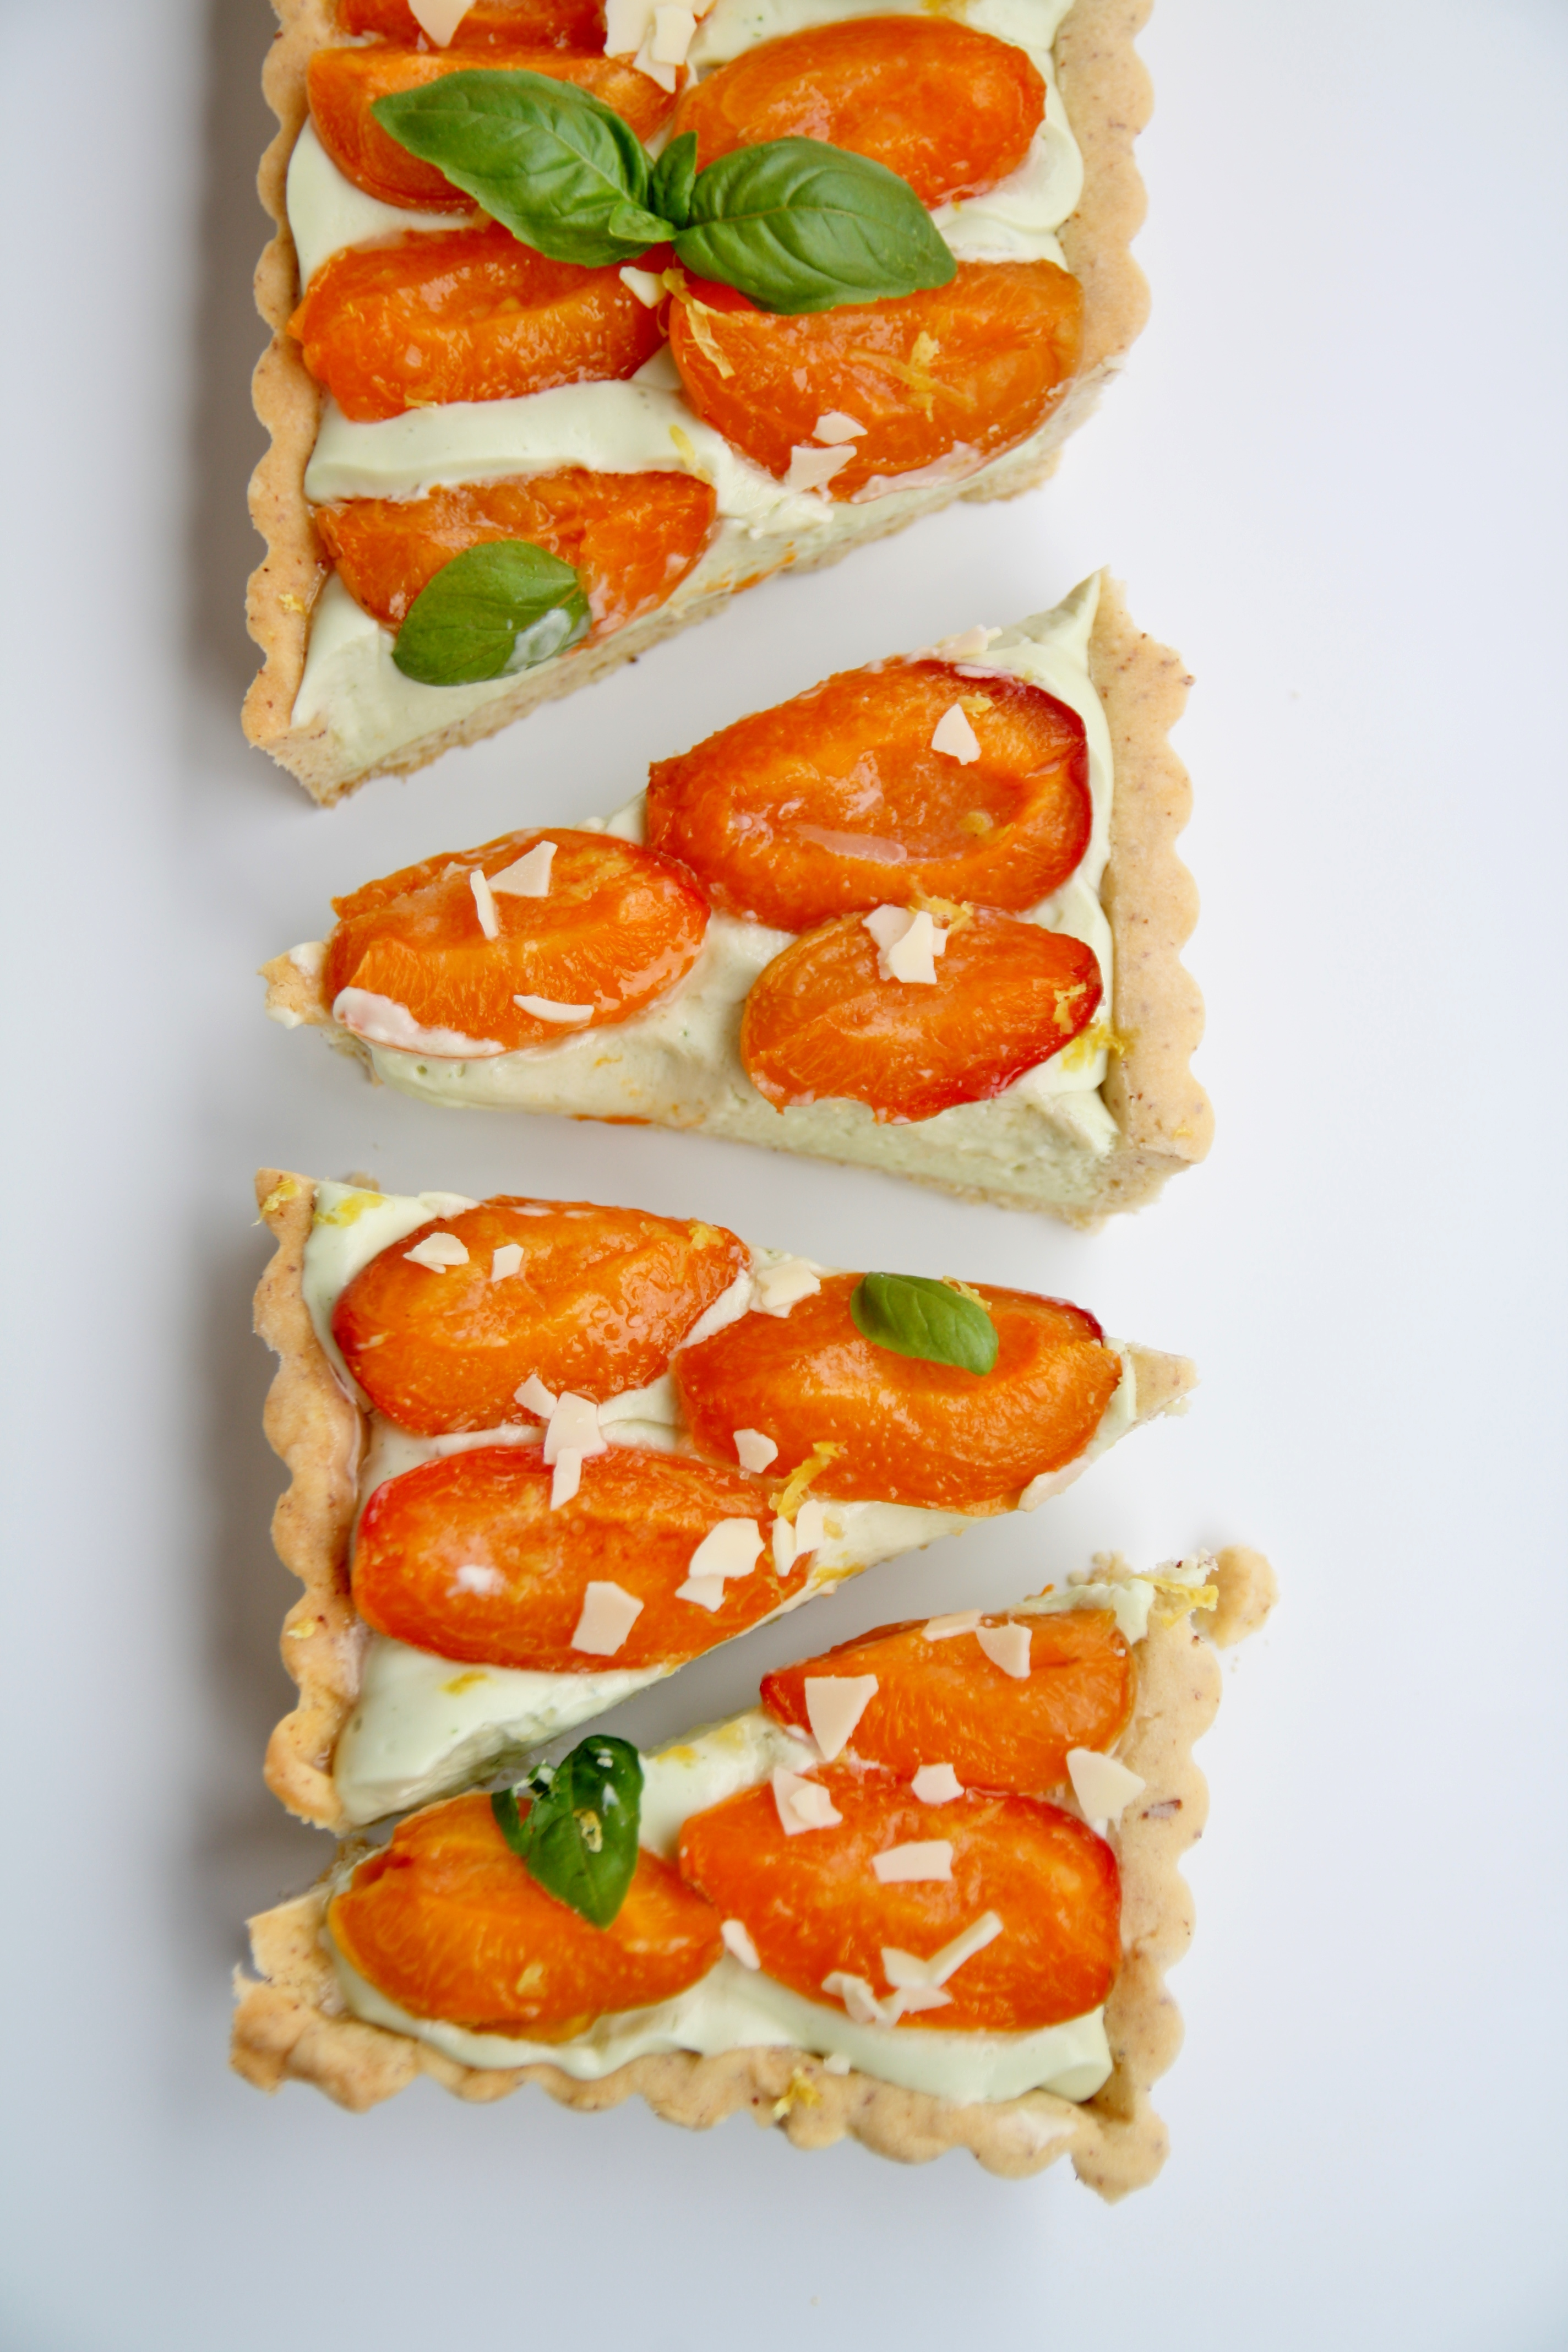 Crostata con namelaka al basilico e albicocche